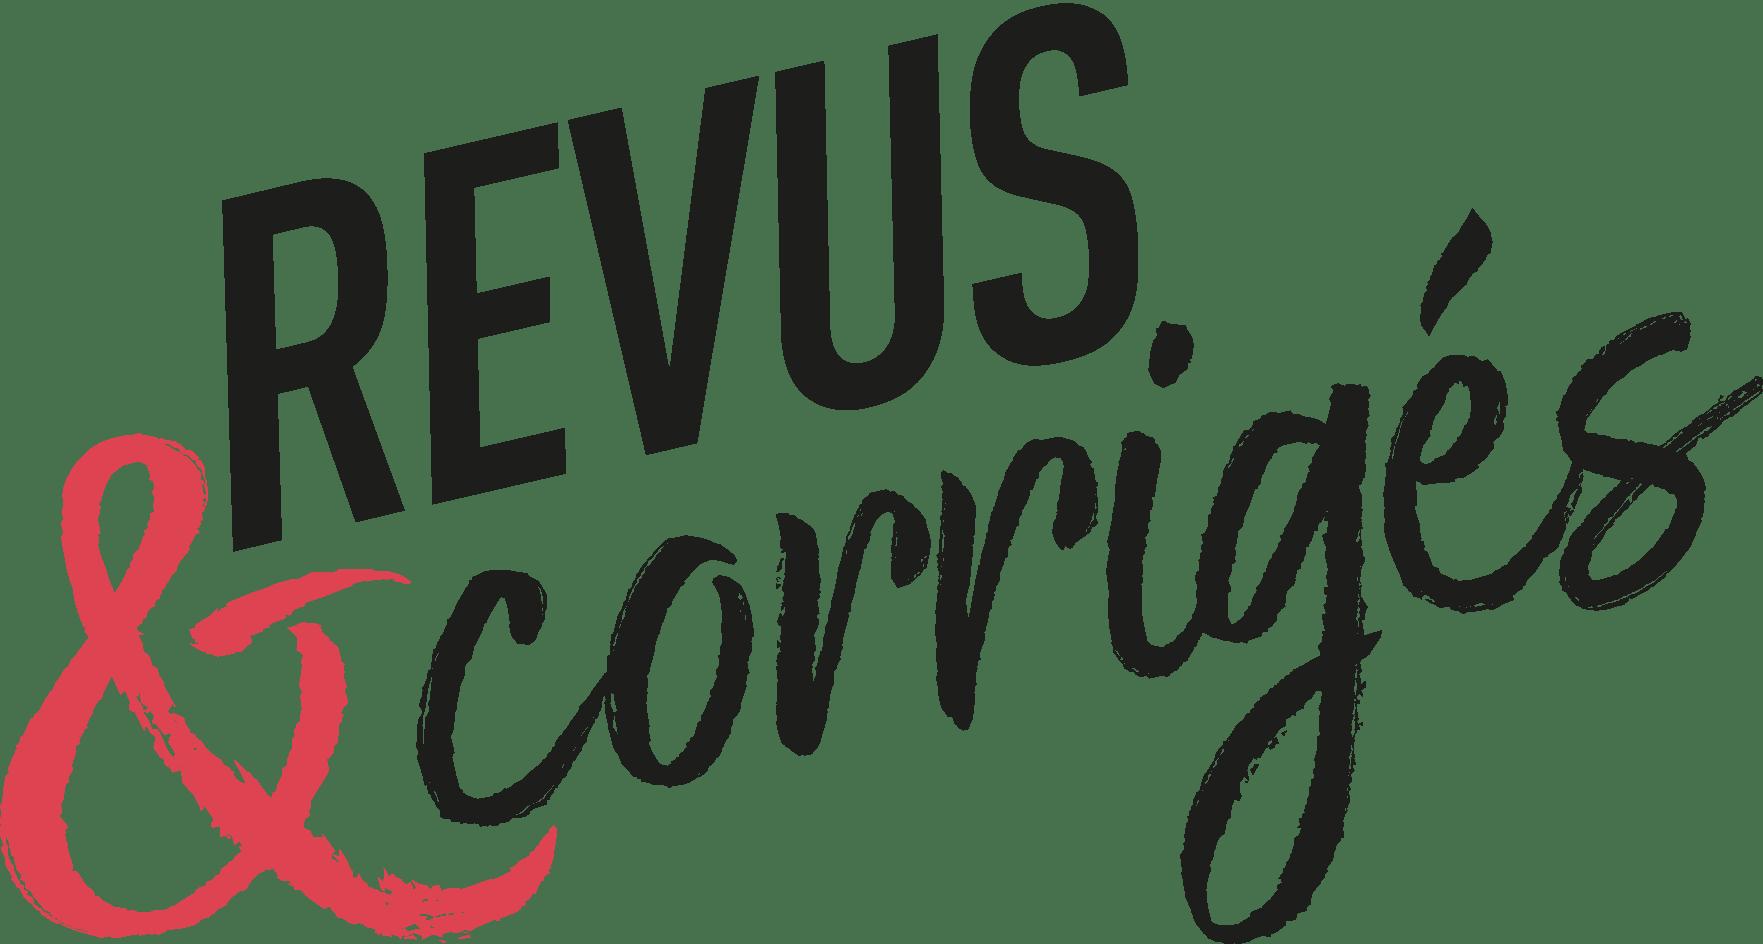 Revus & Corrigés